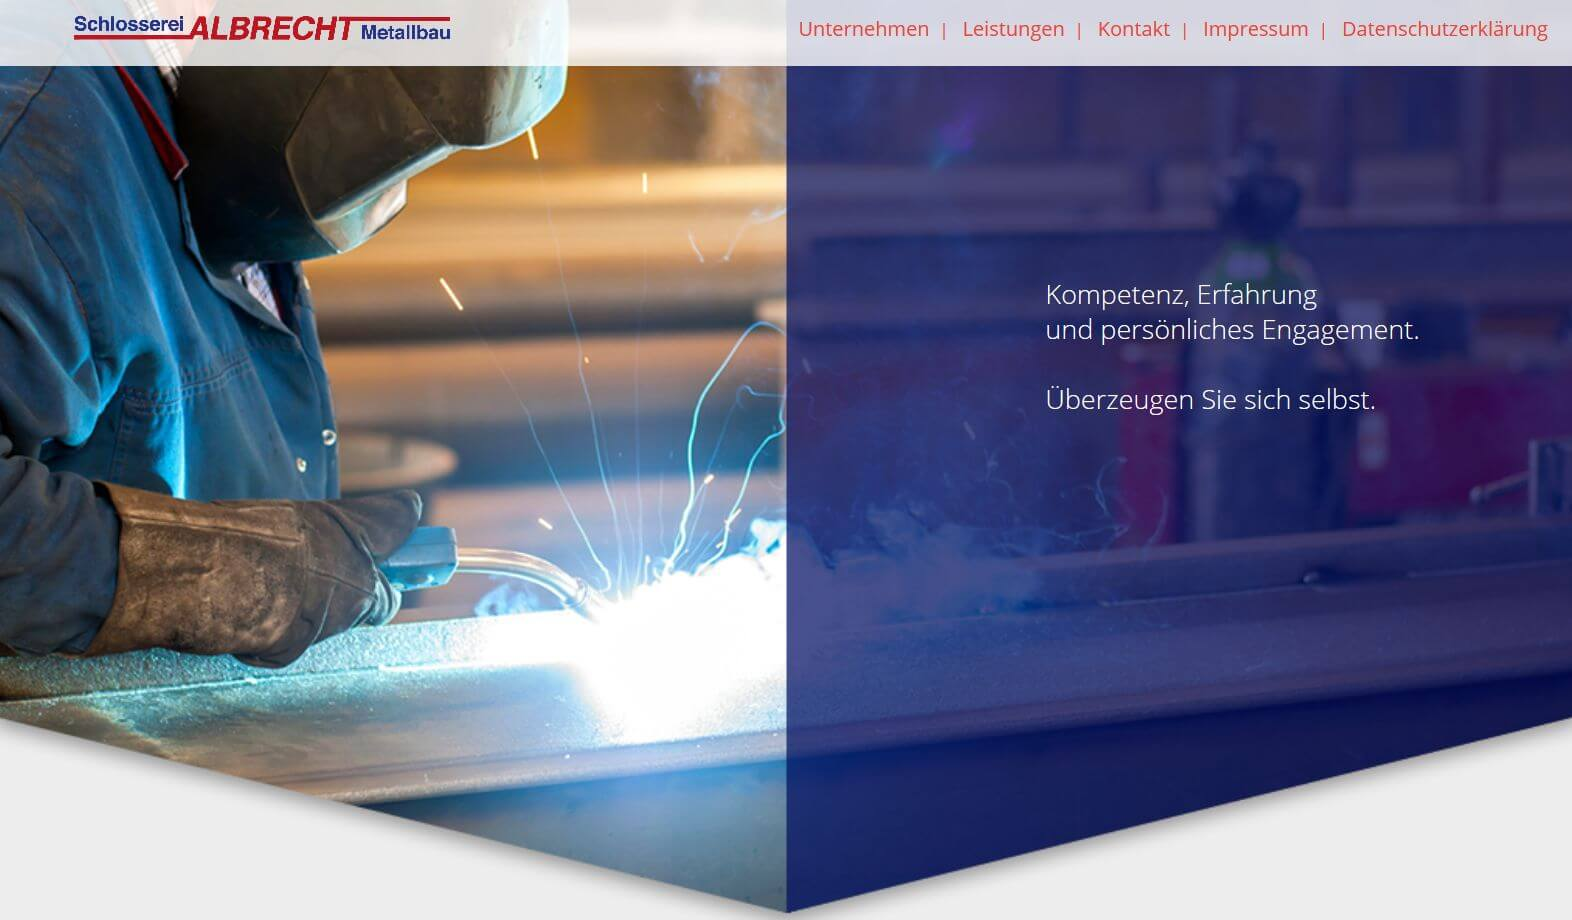 Image of Individuelle Maßanfertigungen aus Metall: Schlosserei Albrecht Metallbau GmbH in Göttingen